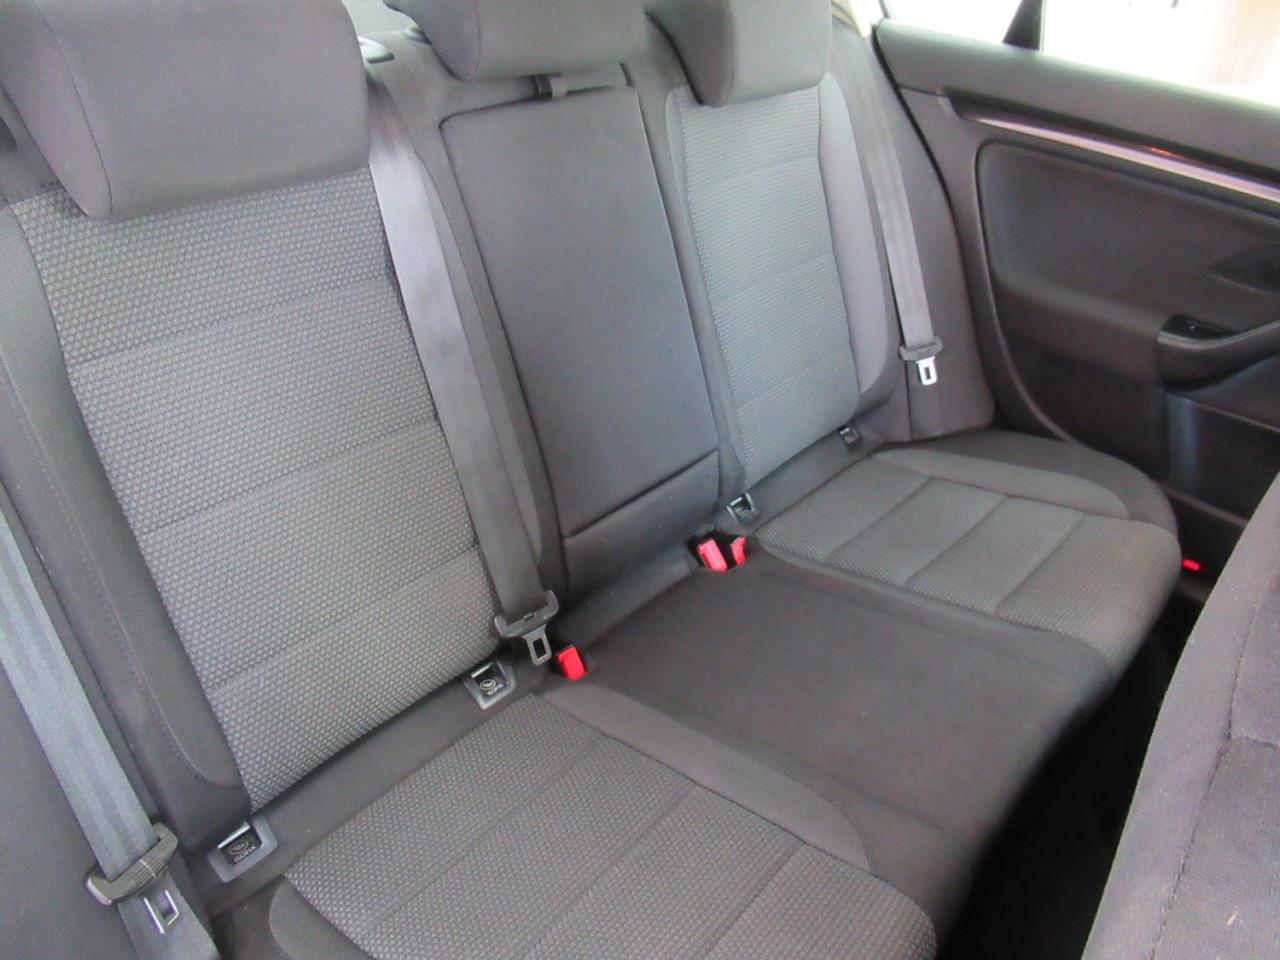 2010 Volkswagen Jetta 1KM MY10 103TDI Sedan Image 20